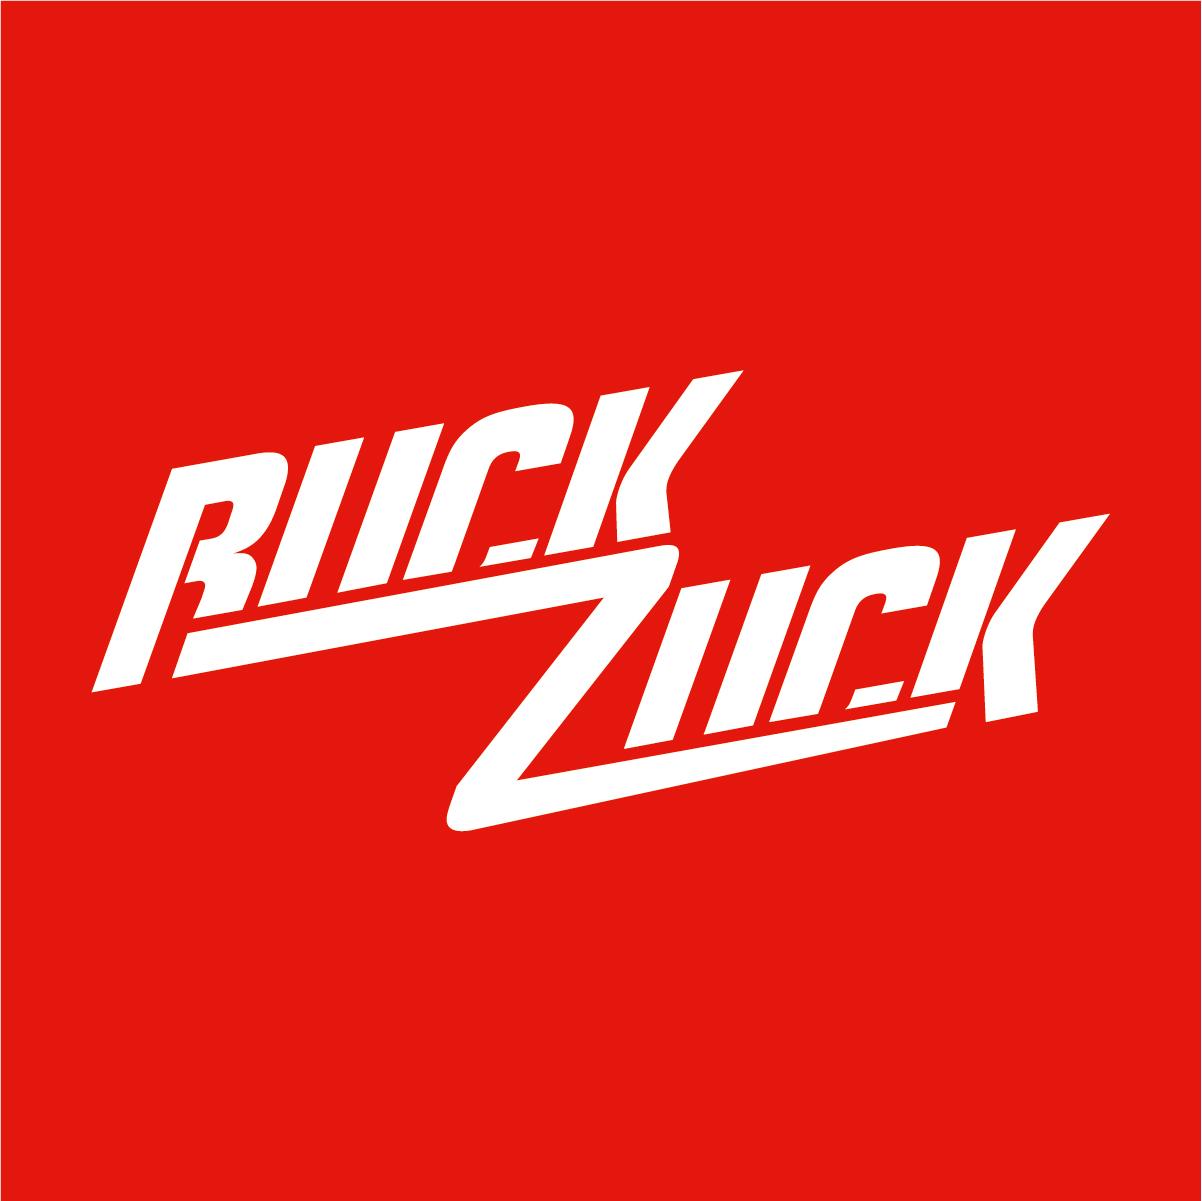 Abschlussprofil selbstklebend Küberit Typ 241 SK SBS edelstahloptik 100 cm